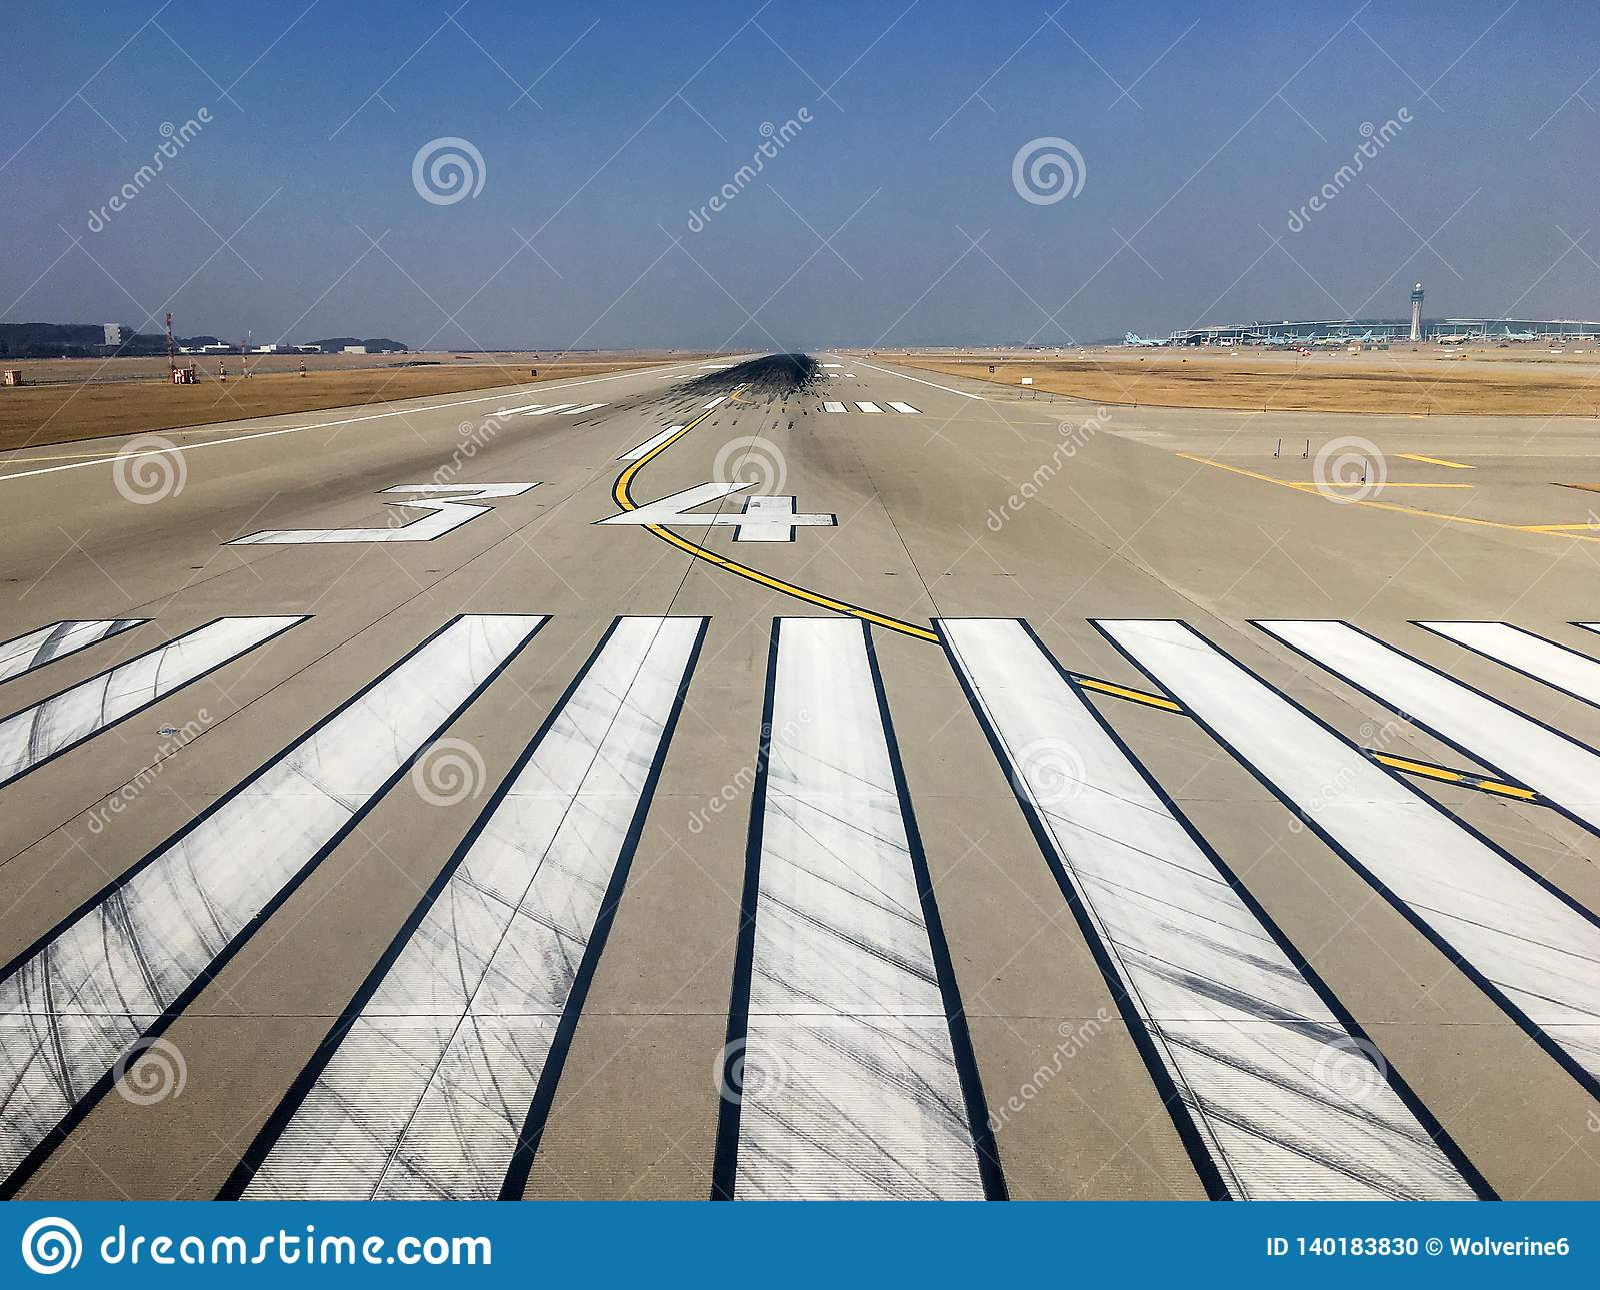 Runway At The Incheon International Airport Stock Photo - Image of ...